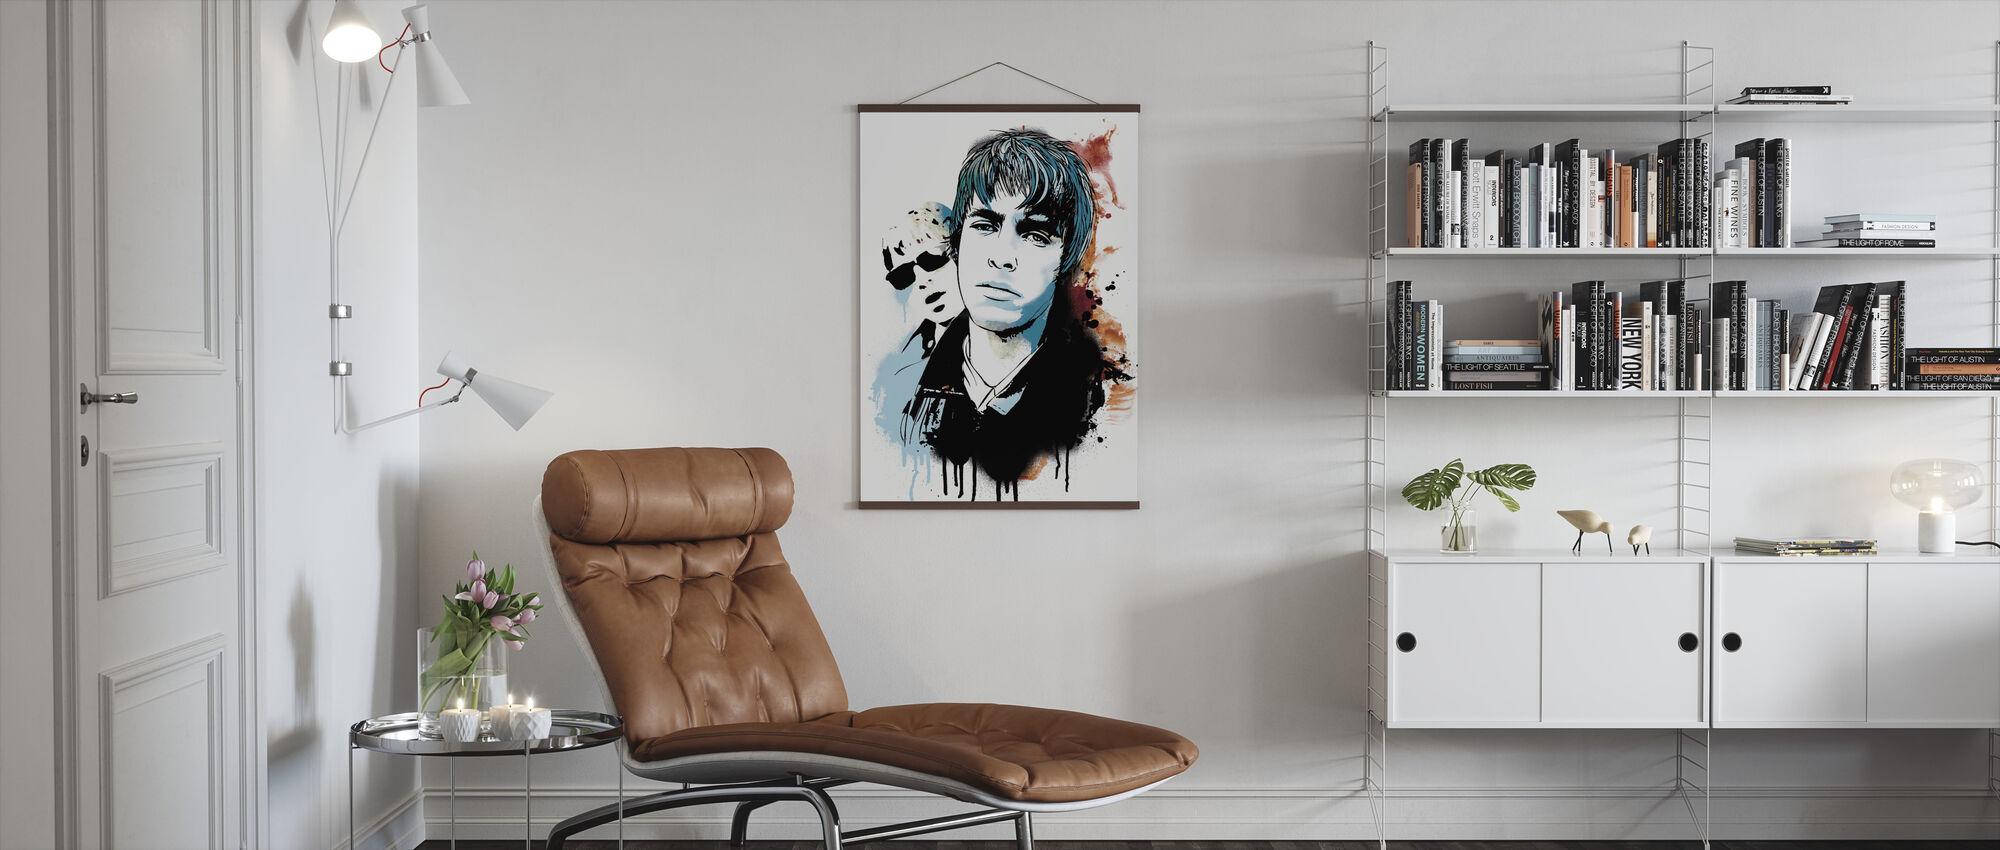 Wonderwall - Poster - Living Room